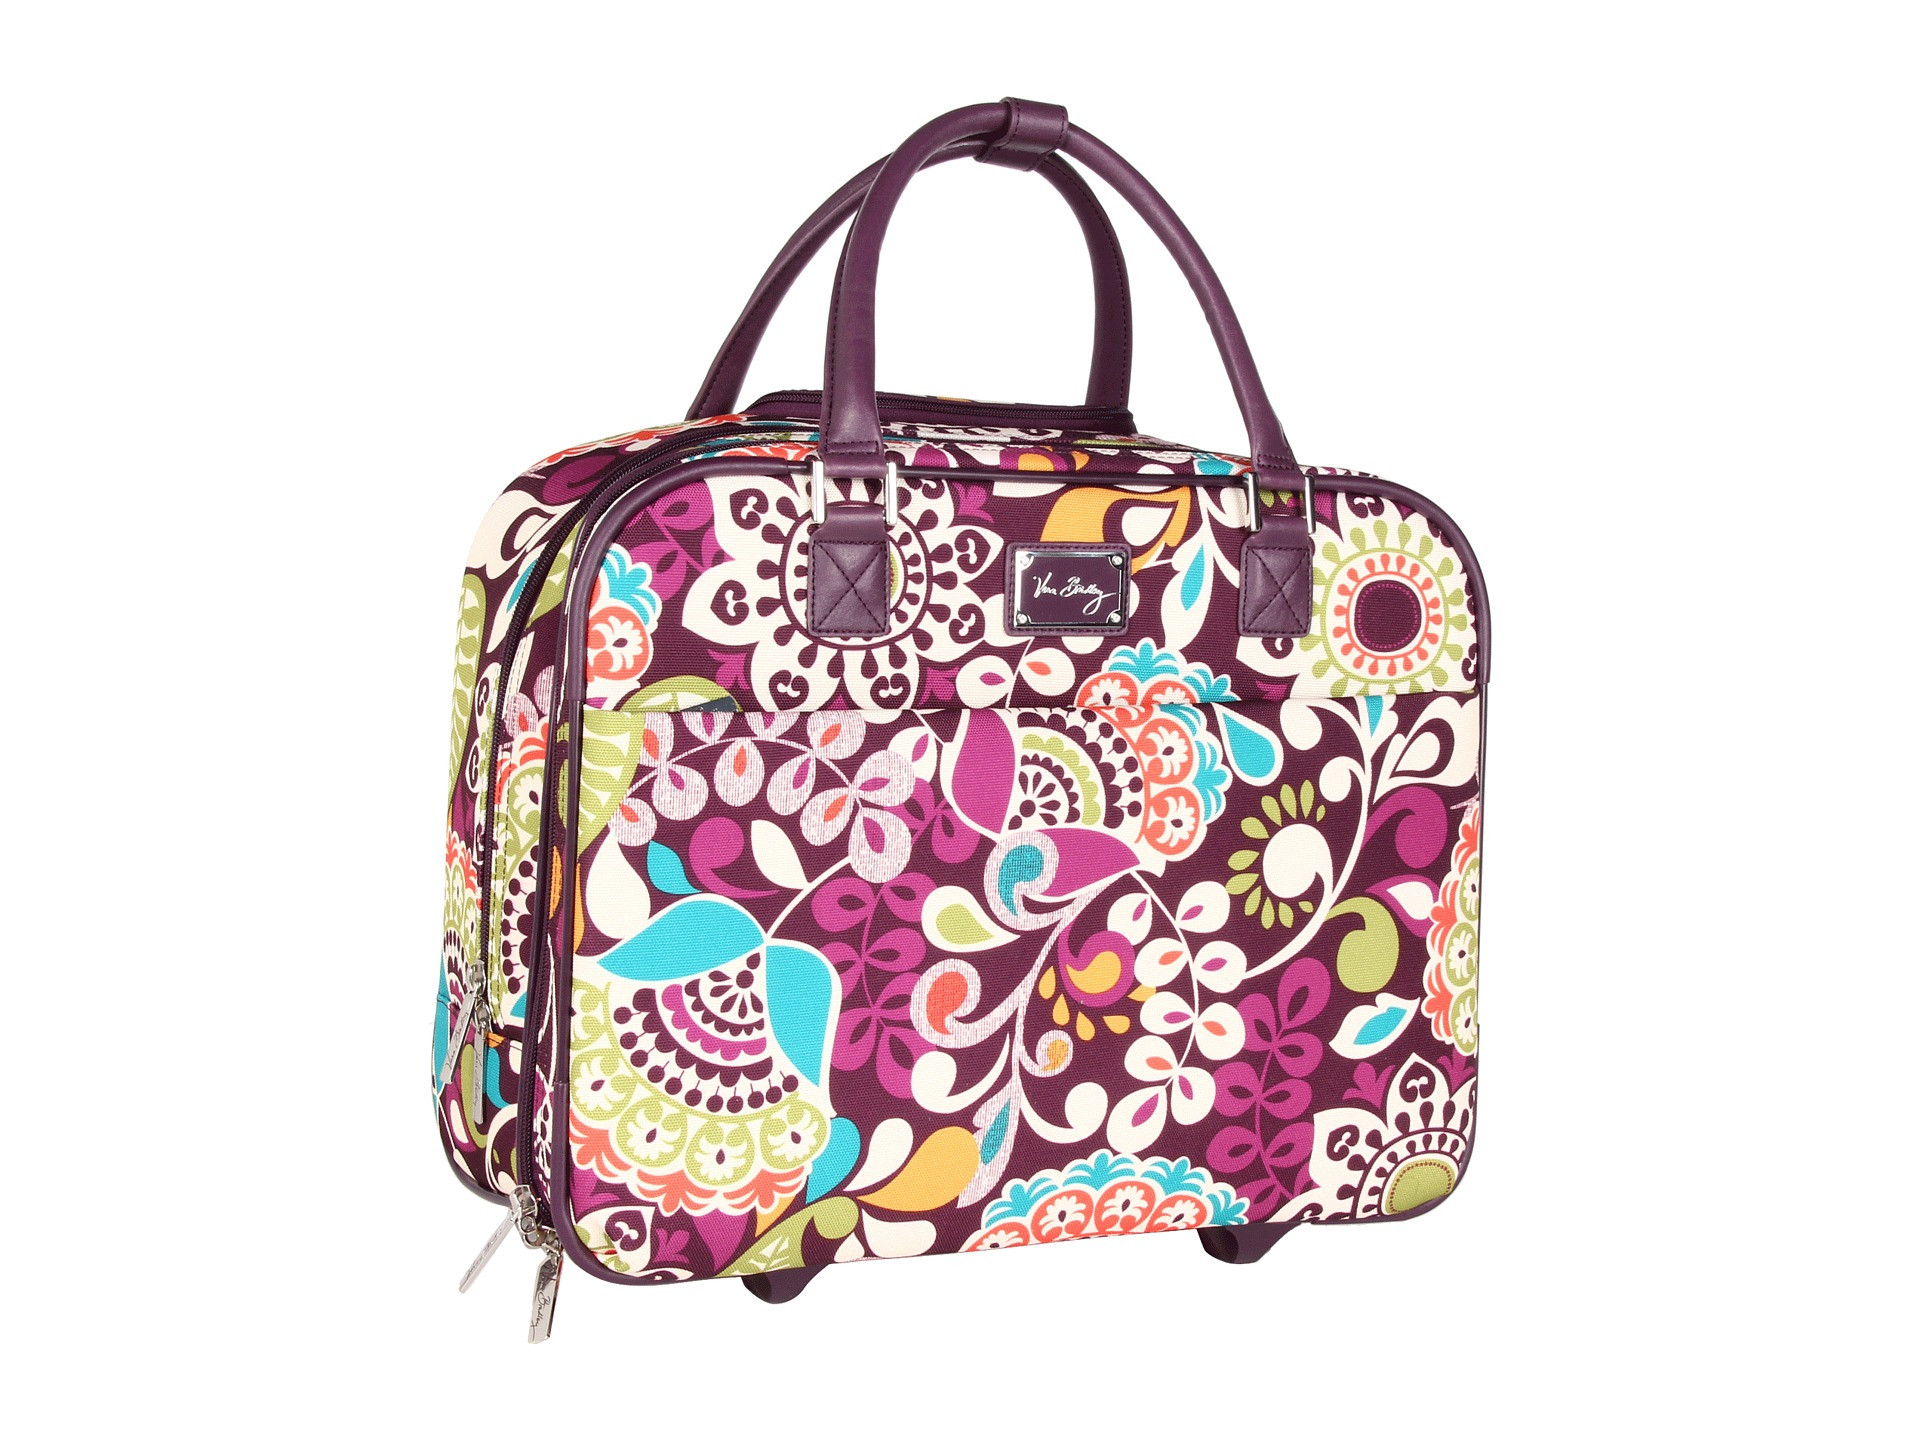 f19e7820b Small Tote Bags: Vera Bradley Luggage With Wheels